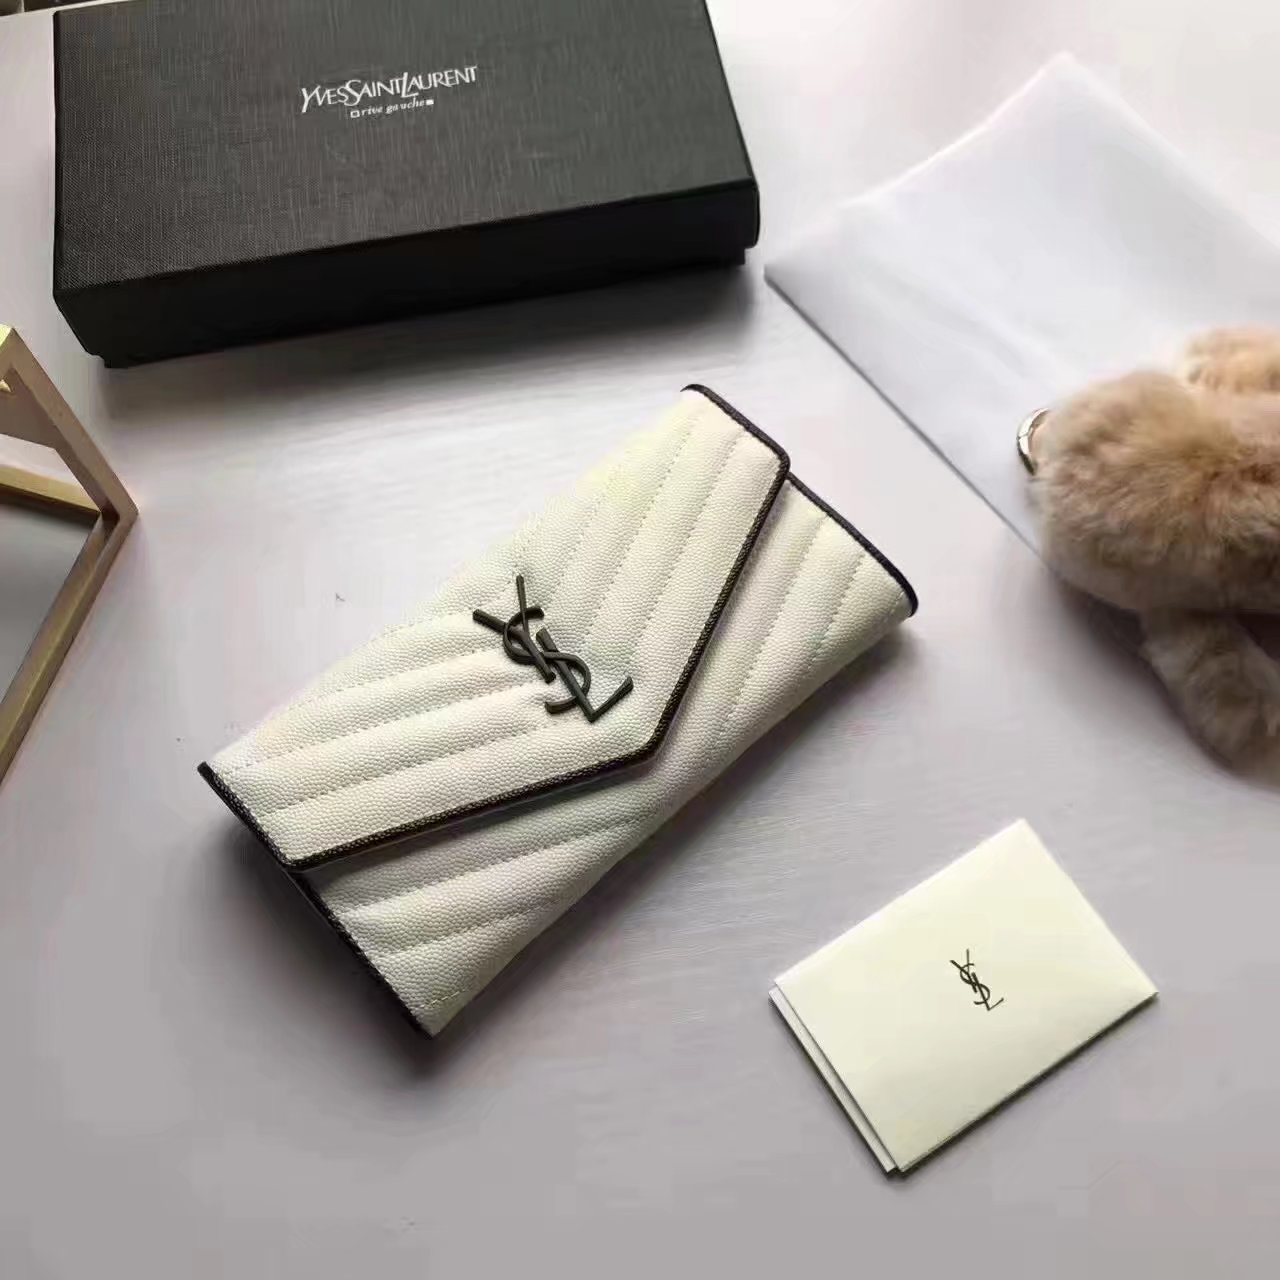 Yves Saint Laurent 2017 Fashion Flap Wallet White